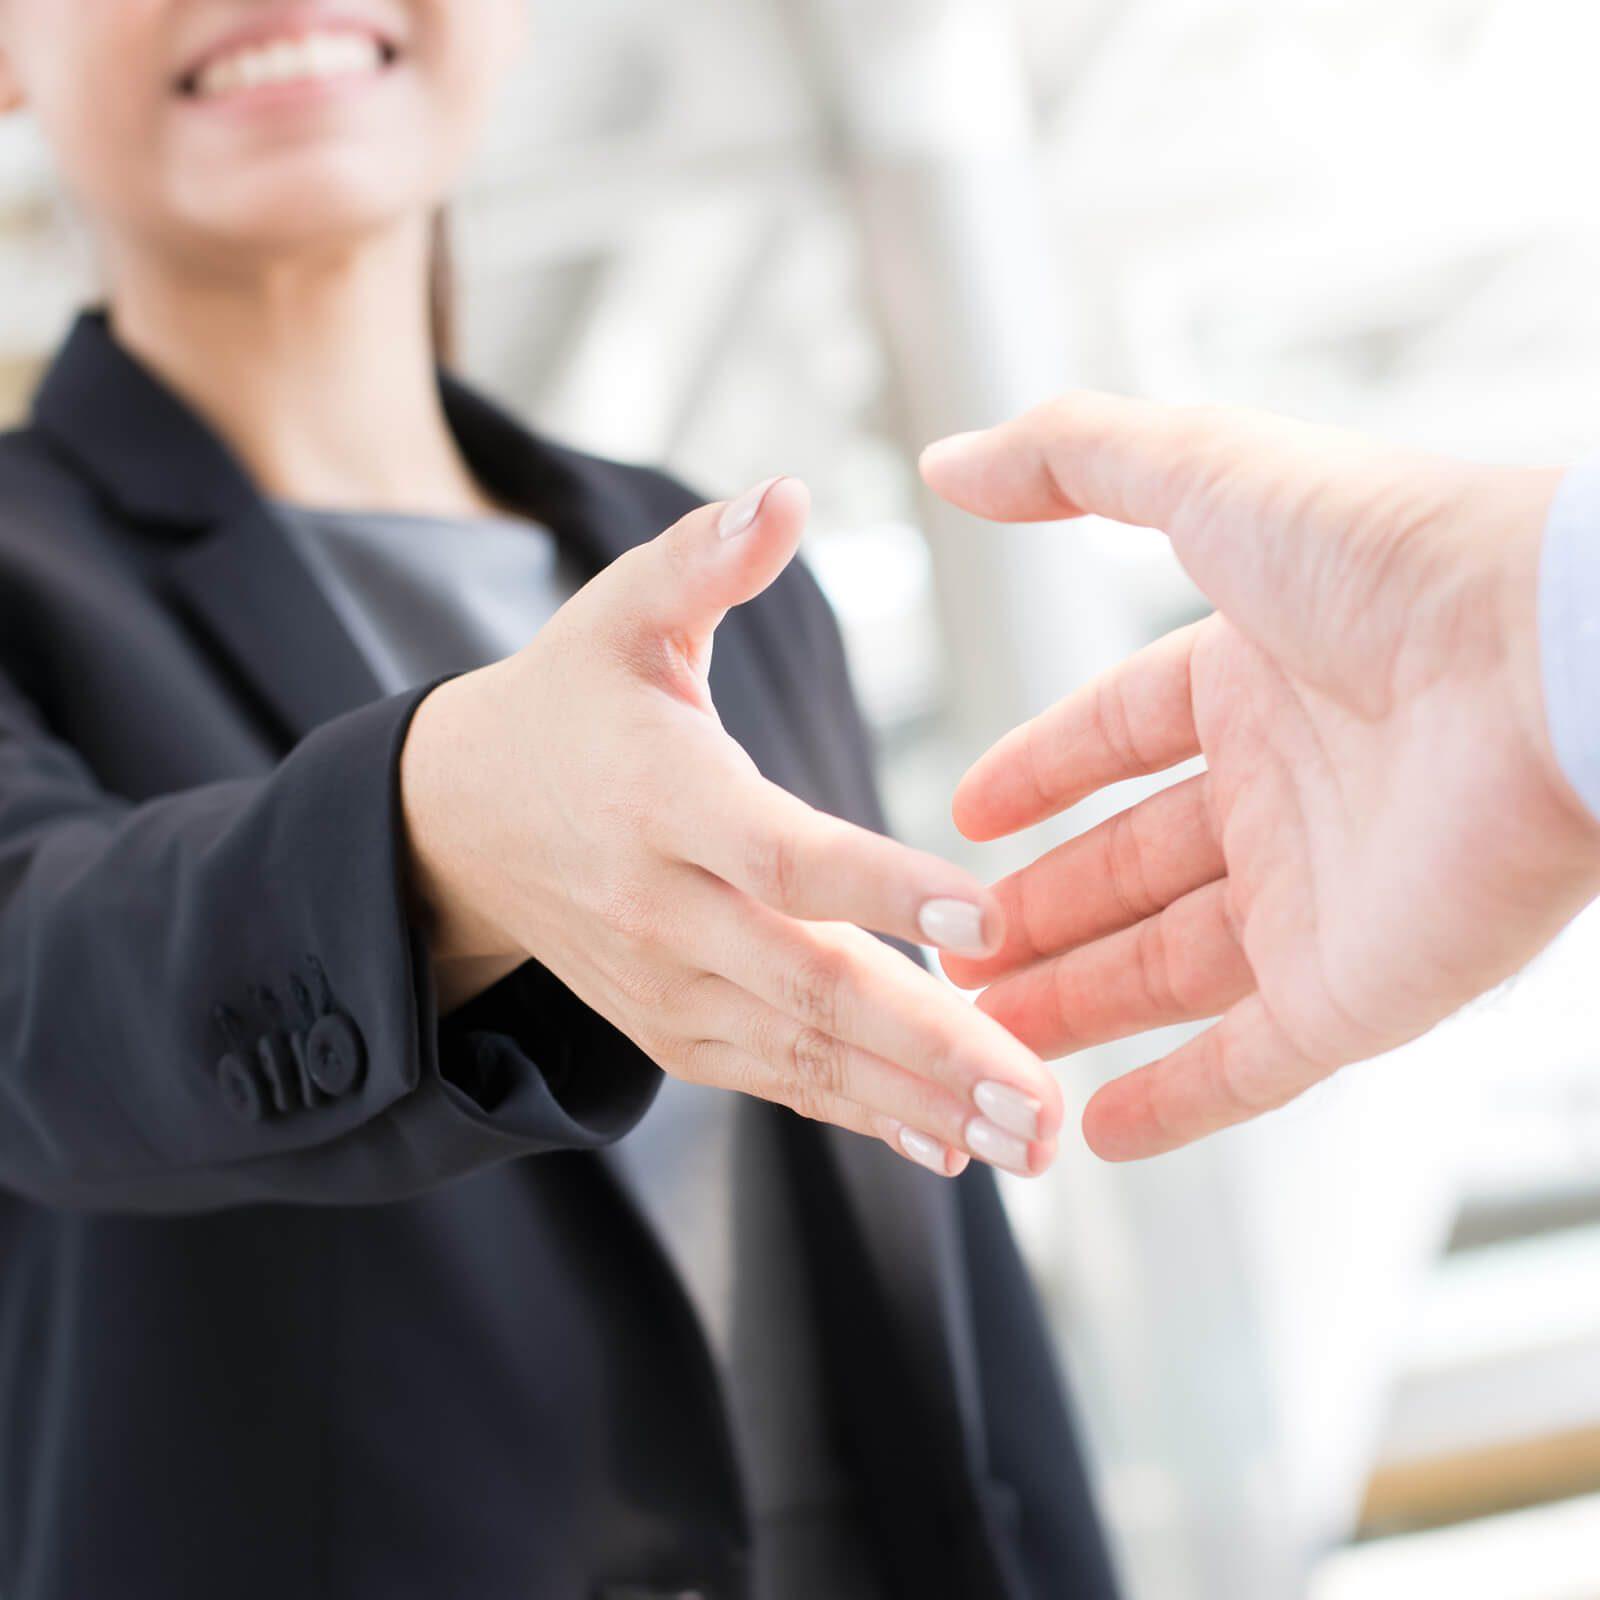 Shaking hands | Tom January Floors